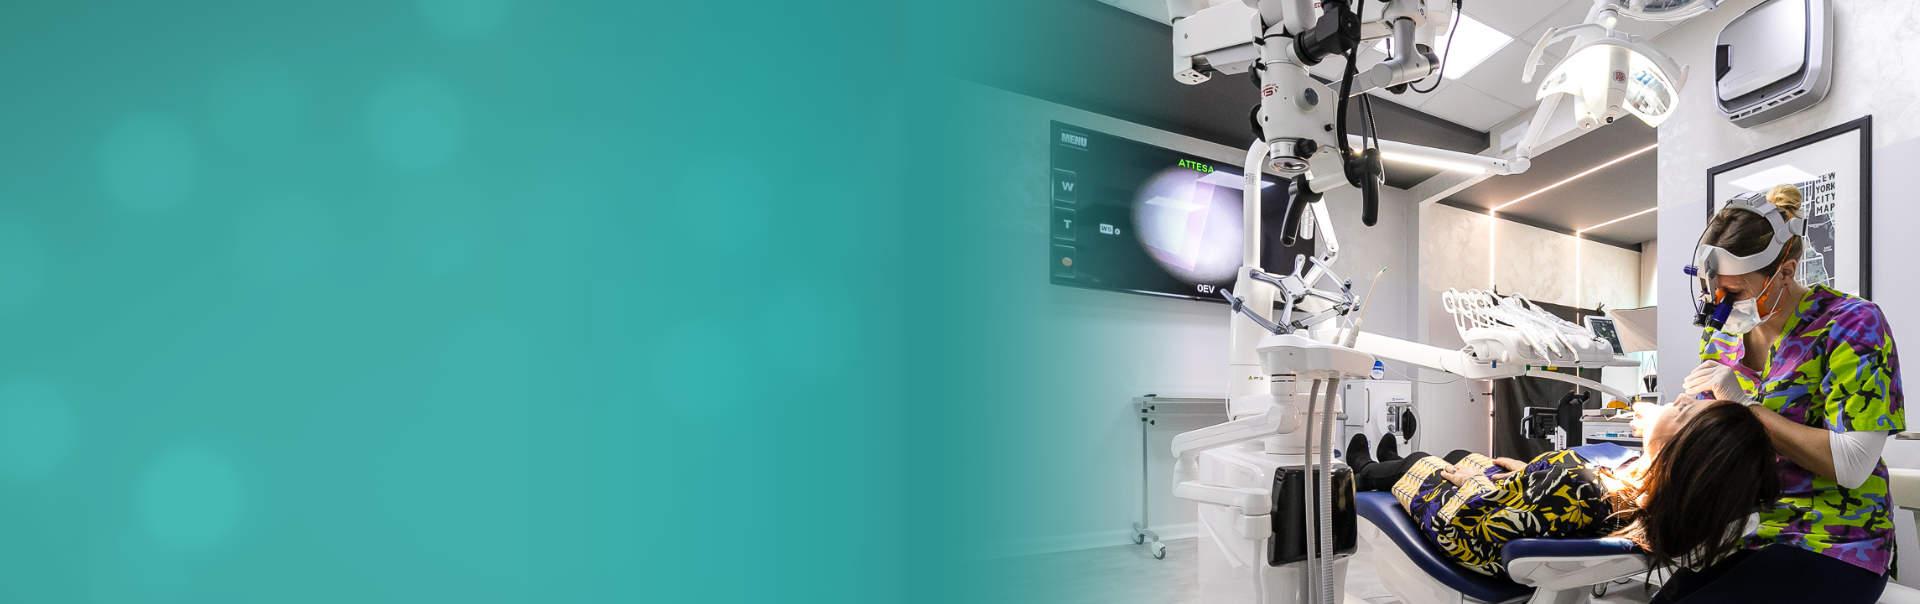 Dentista tecnologie avanzate Ivrea